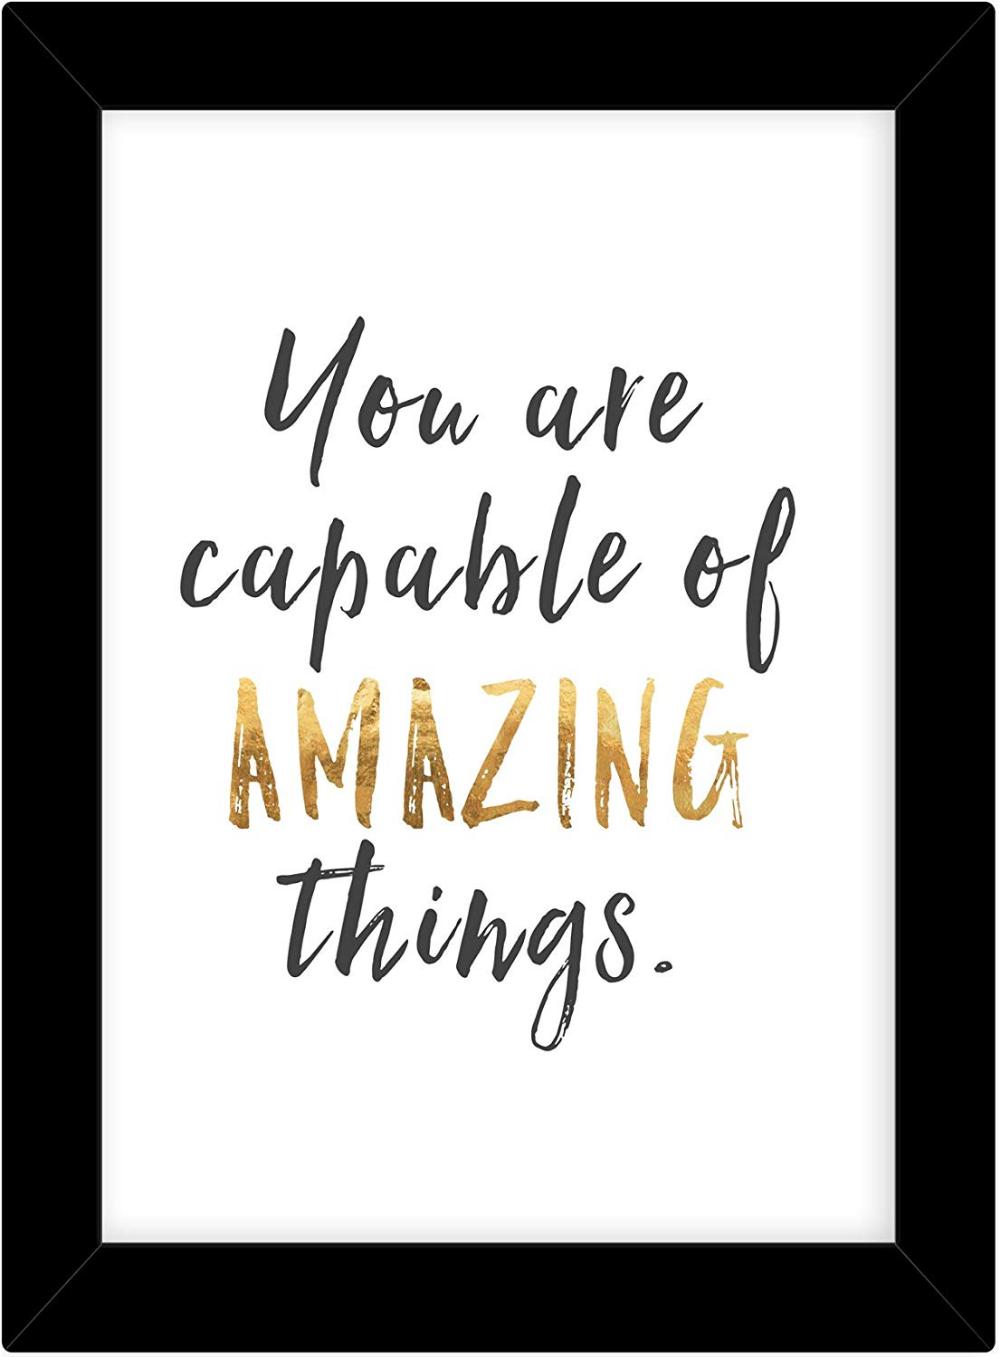 inspirational Saying Framed poster